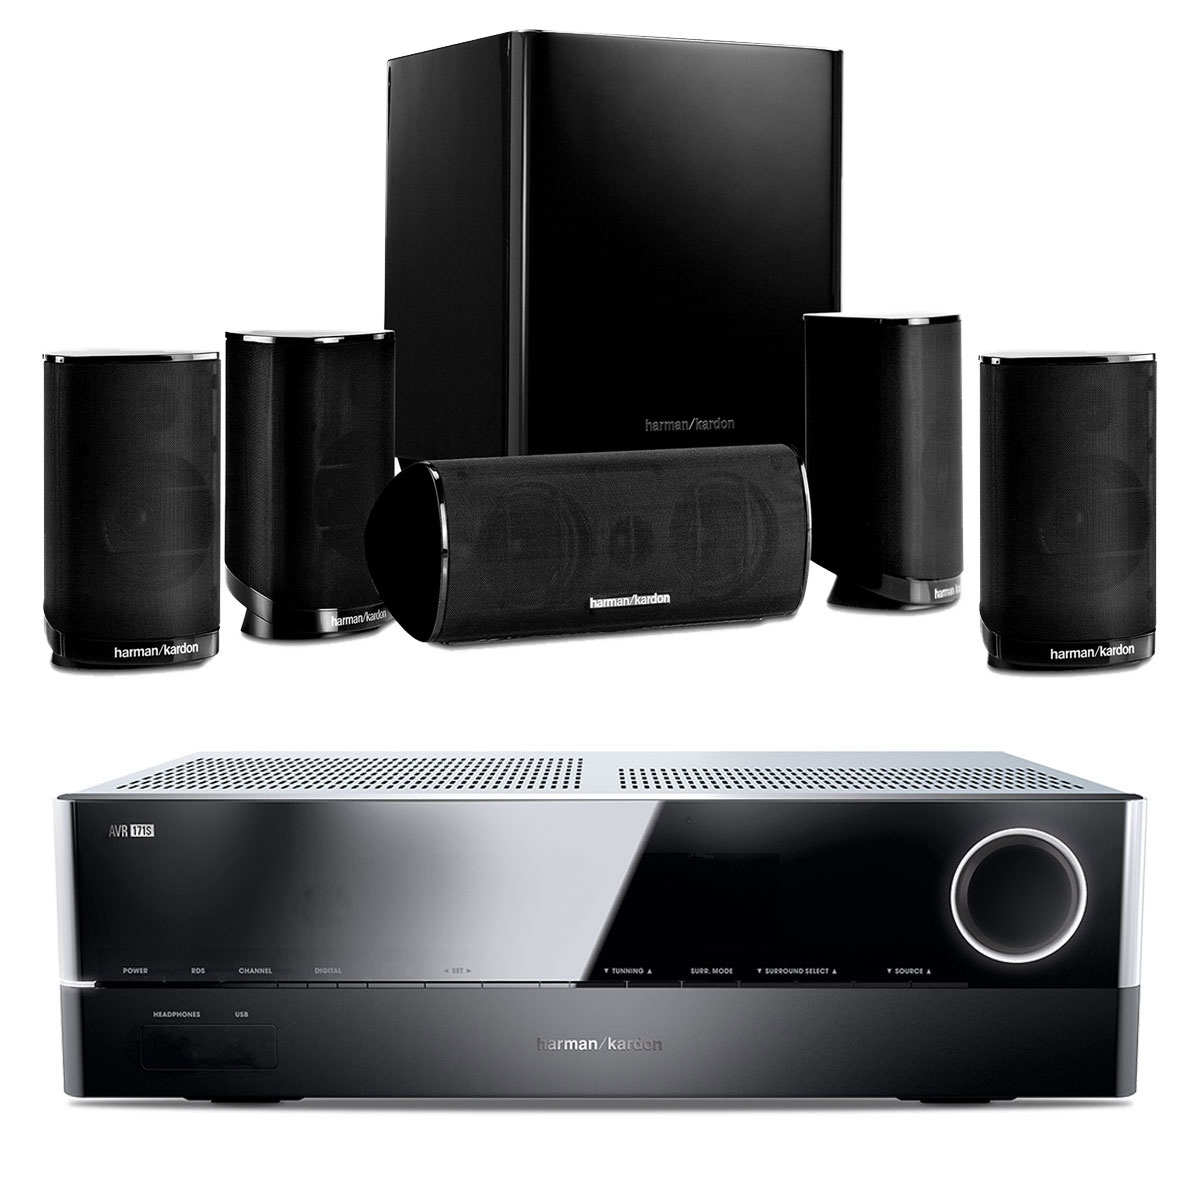 Ensemble home cinéma Harman Kardon AVR 171S + Harman Kardon HKTS 9 Amplificateur 7.2 - 100 W DLNA Bluetooth Spotify HDMI + Pack d'enceintes 5.1 compactes avec caisson de basses actif